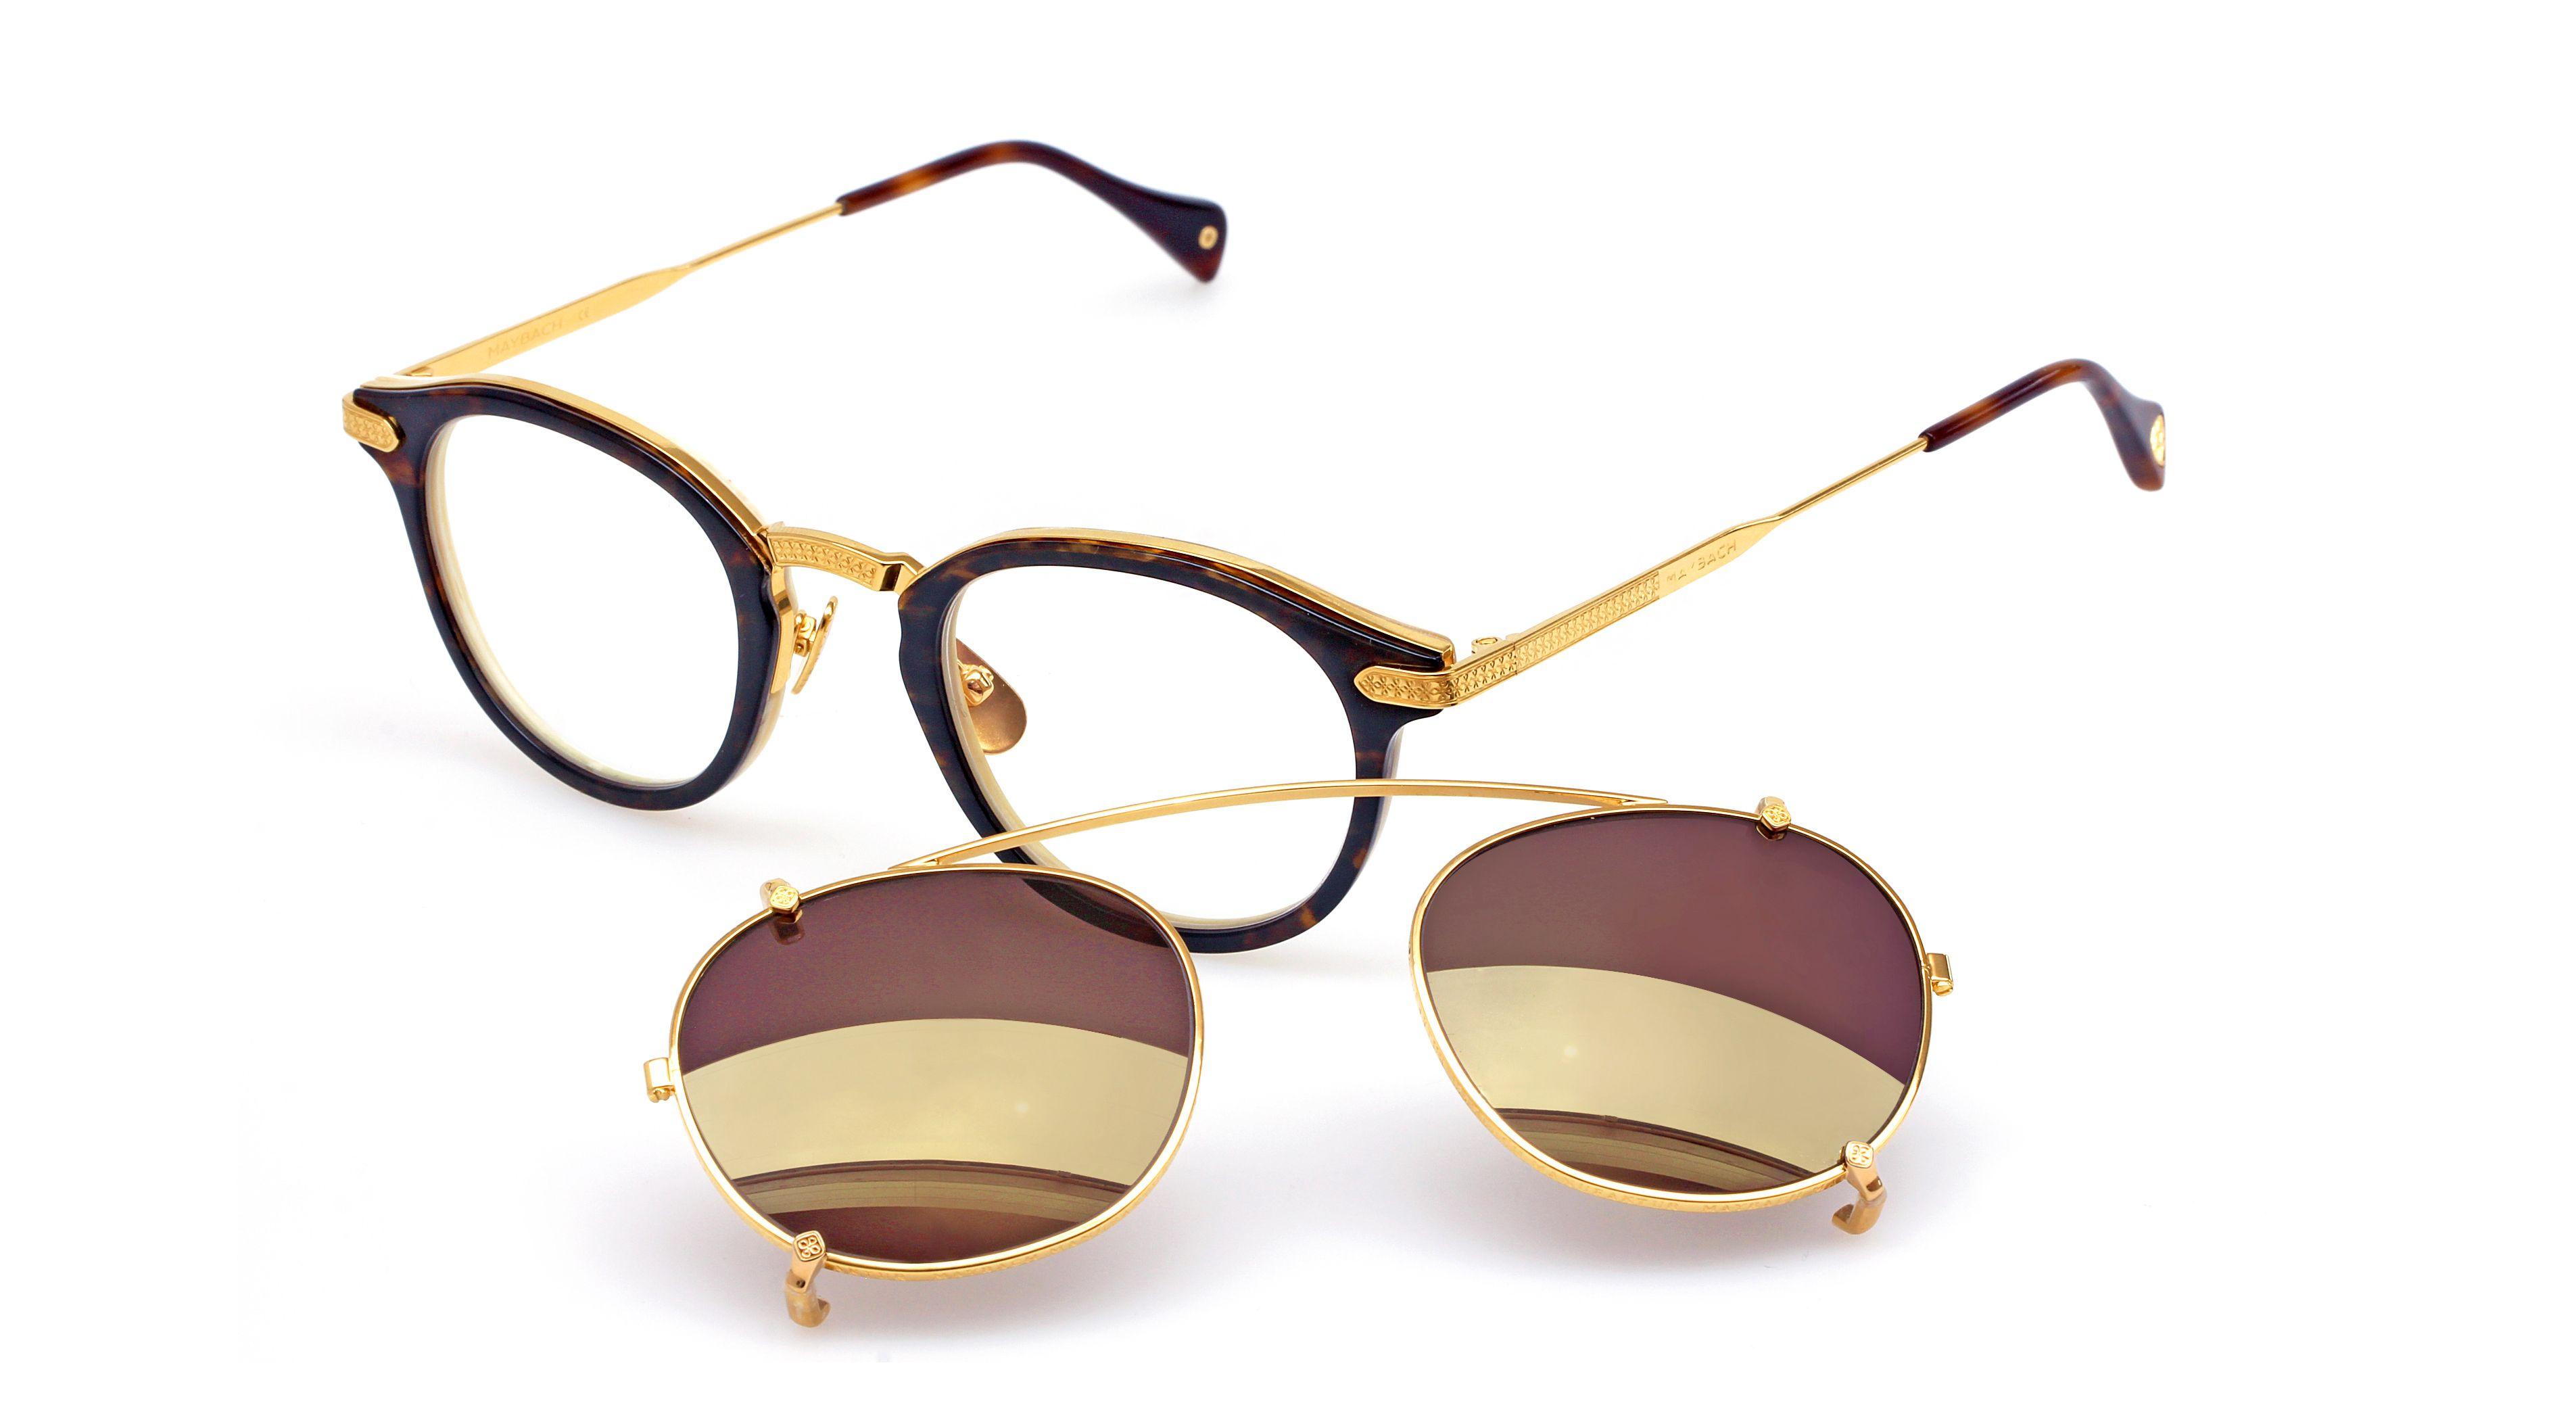 MAYBACH | frame: The Delight II | Accessories: Eyewear | Pinterest